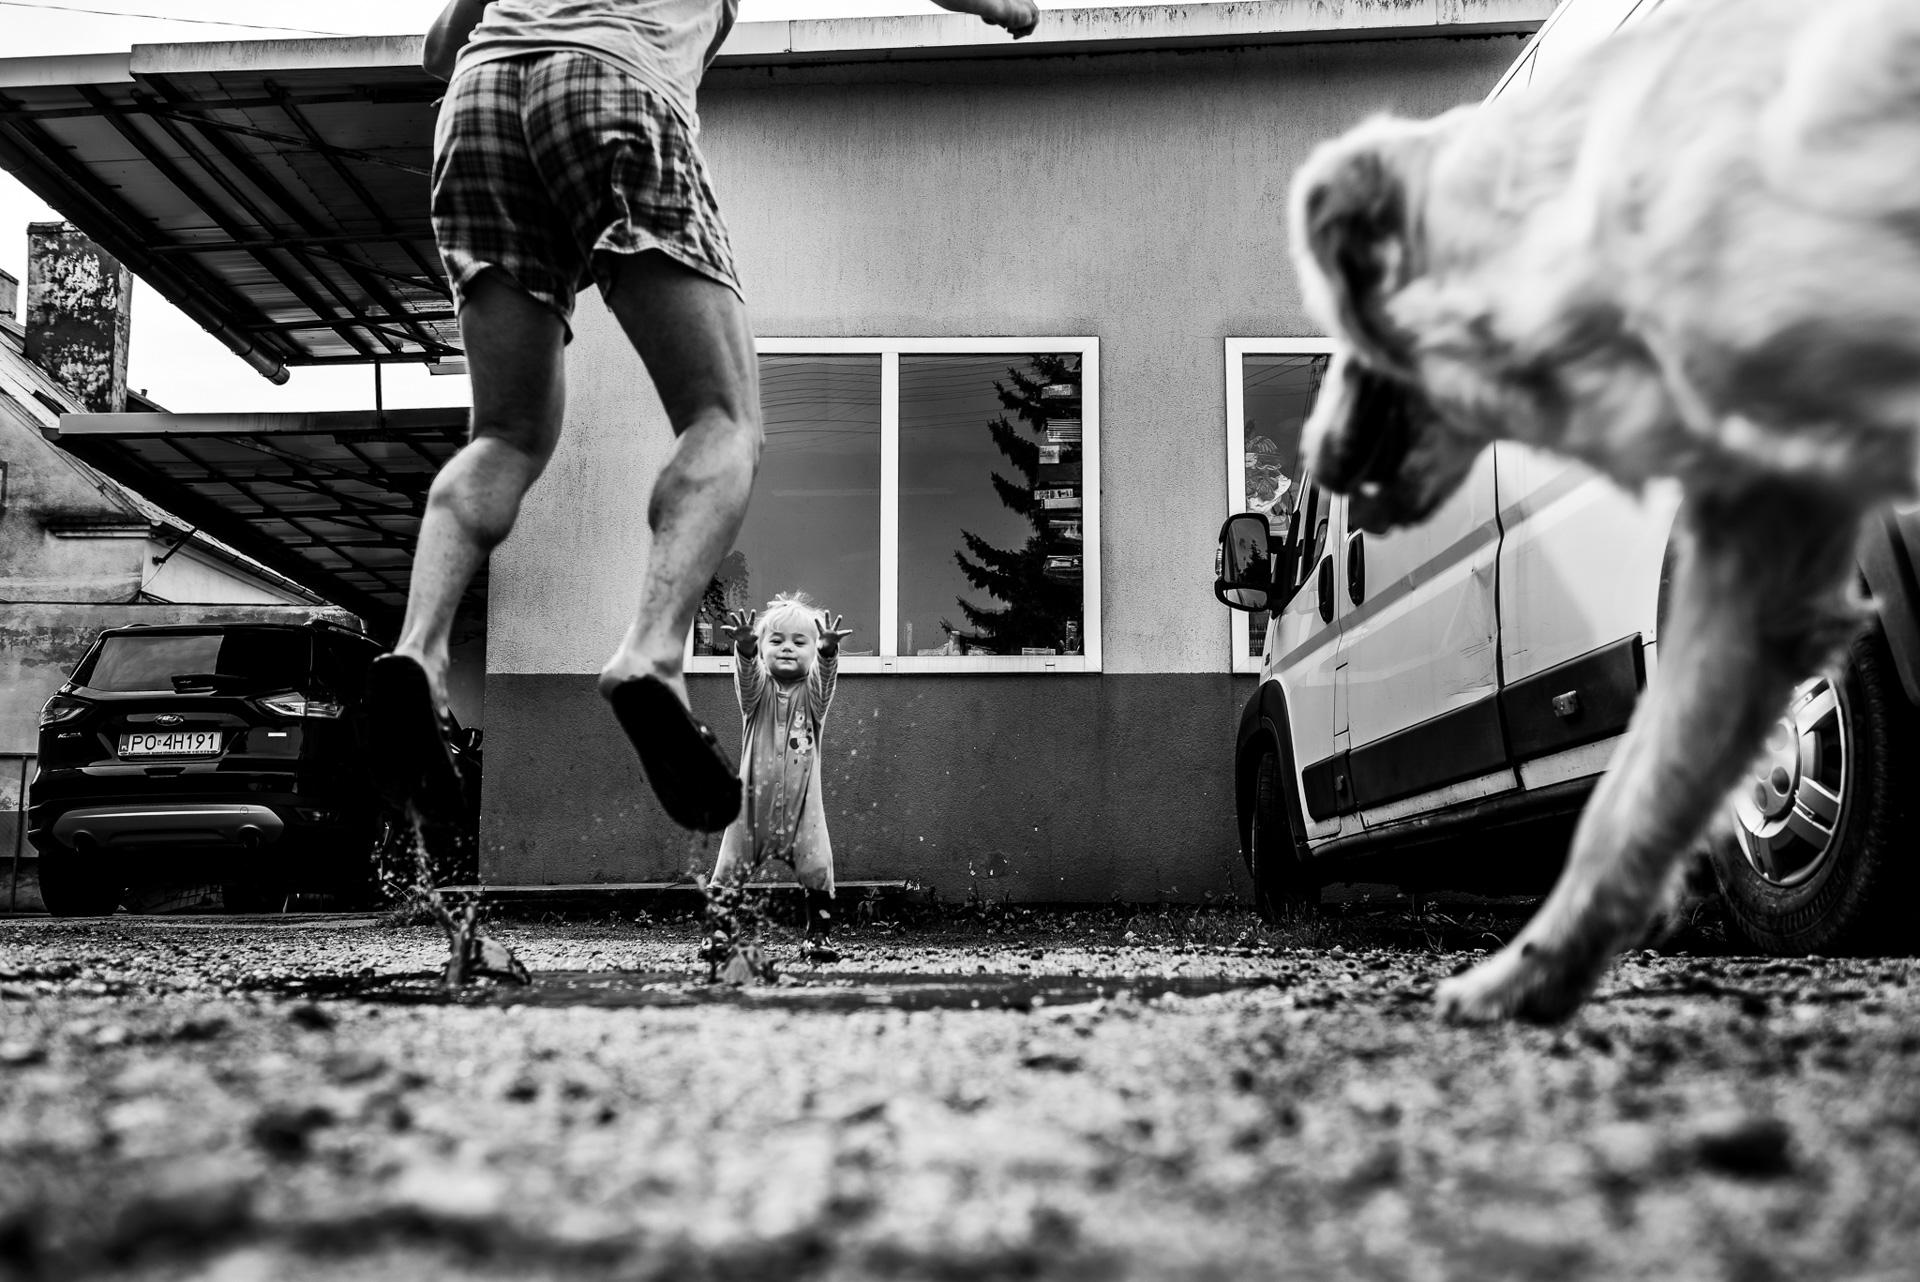 """Little Wizard"", fot. Marlena Kurowska-Jankowiak, Sony World Photography Awards 2019."